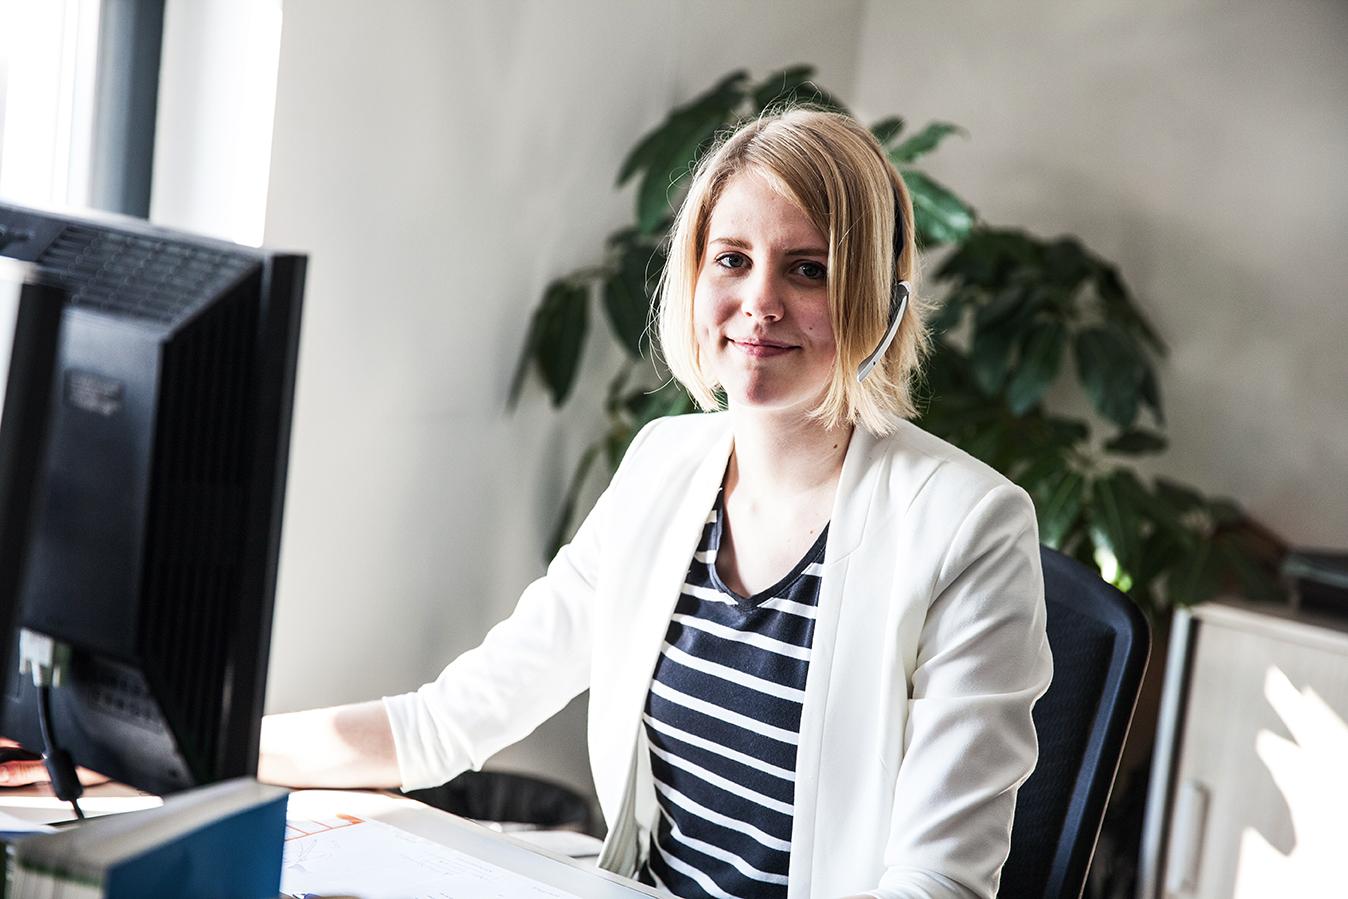 Freya Wittkugel - Duales Studium bei Kühne + Nagel Hamburg